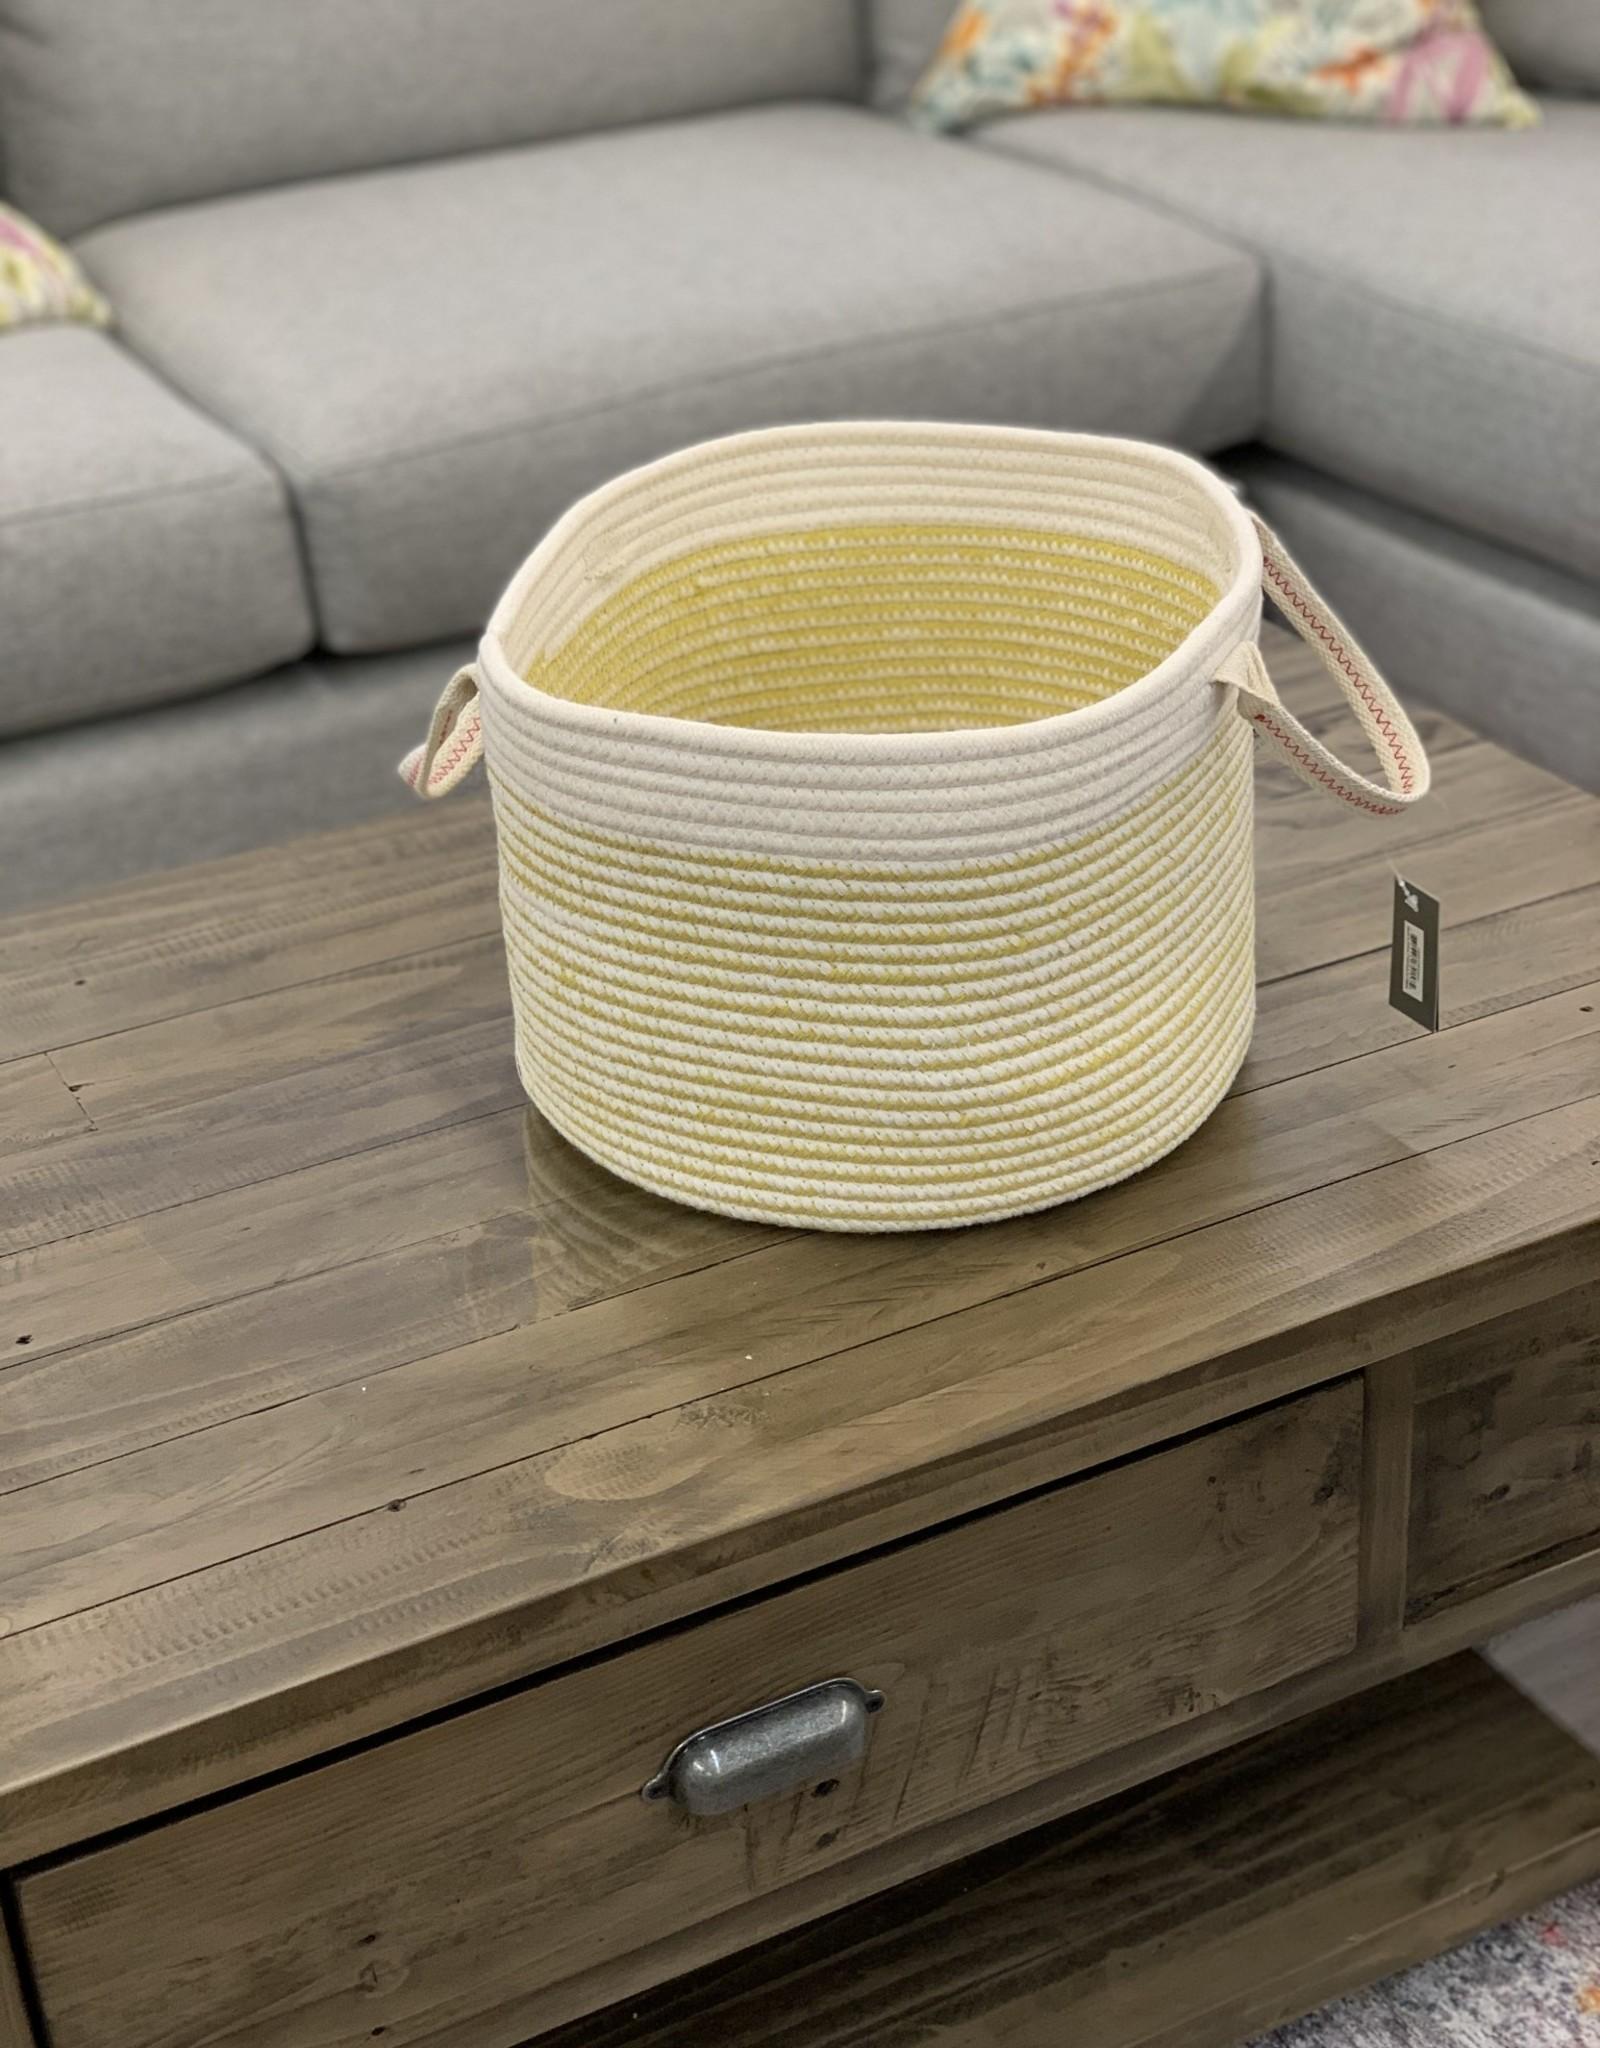 Basket Candym Woven Yellow Small